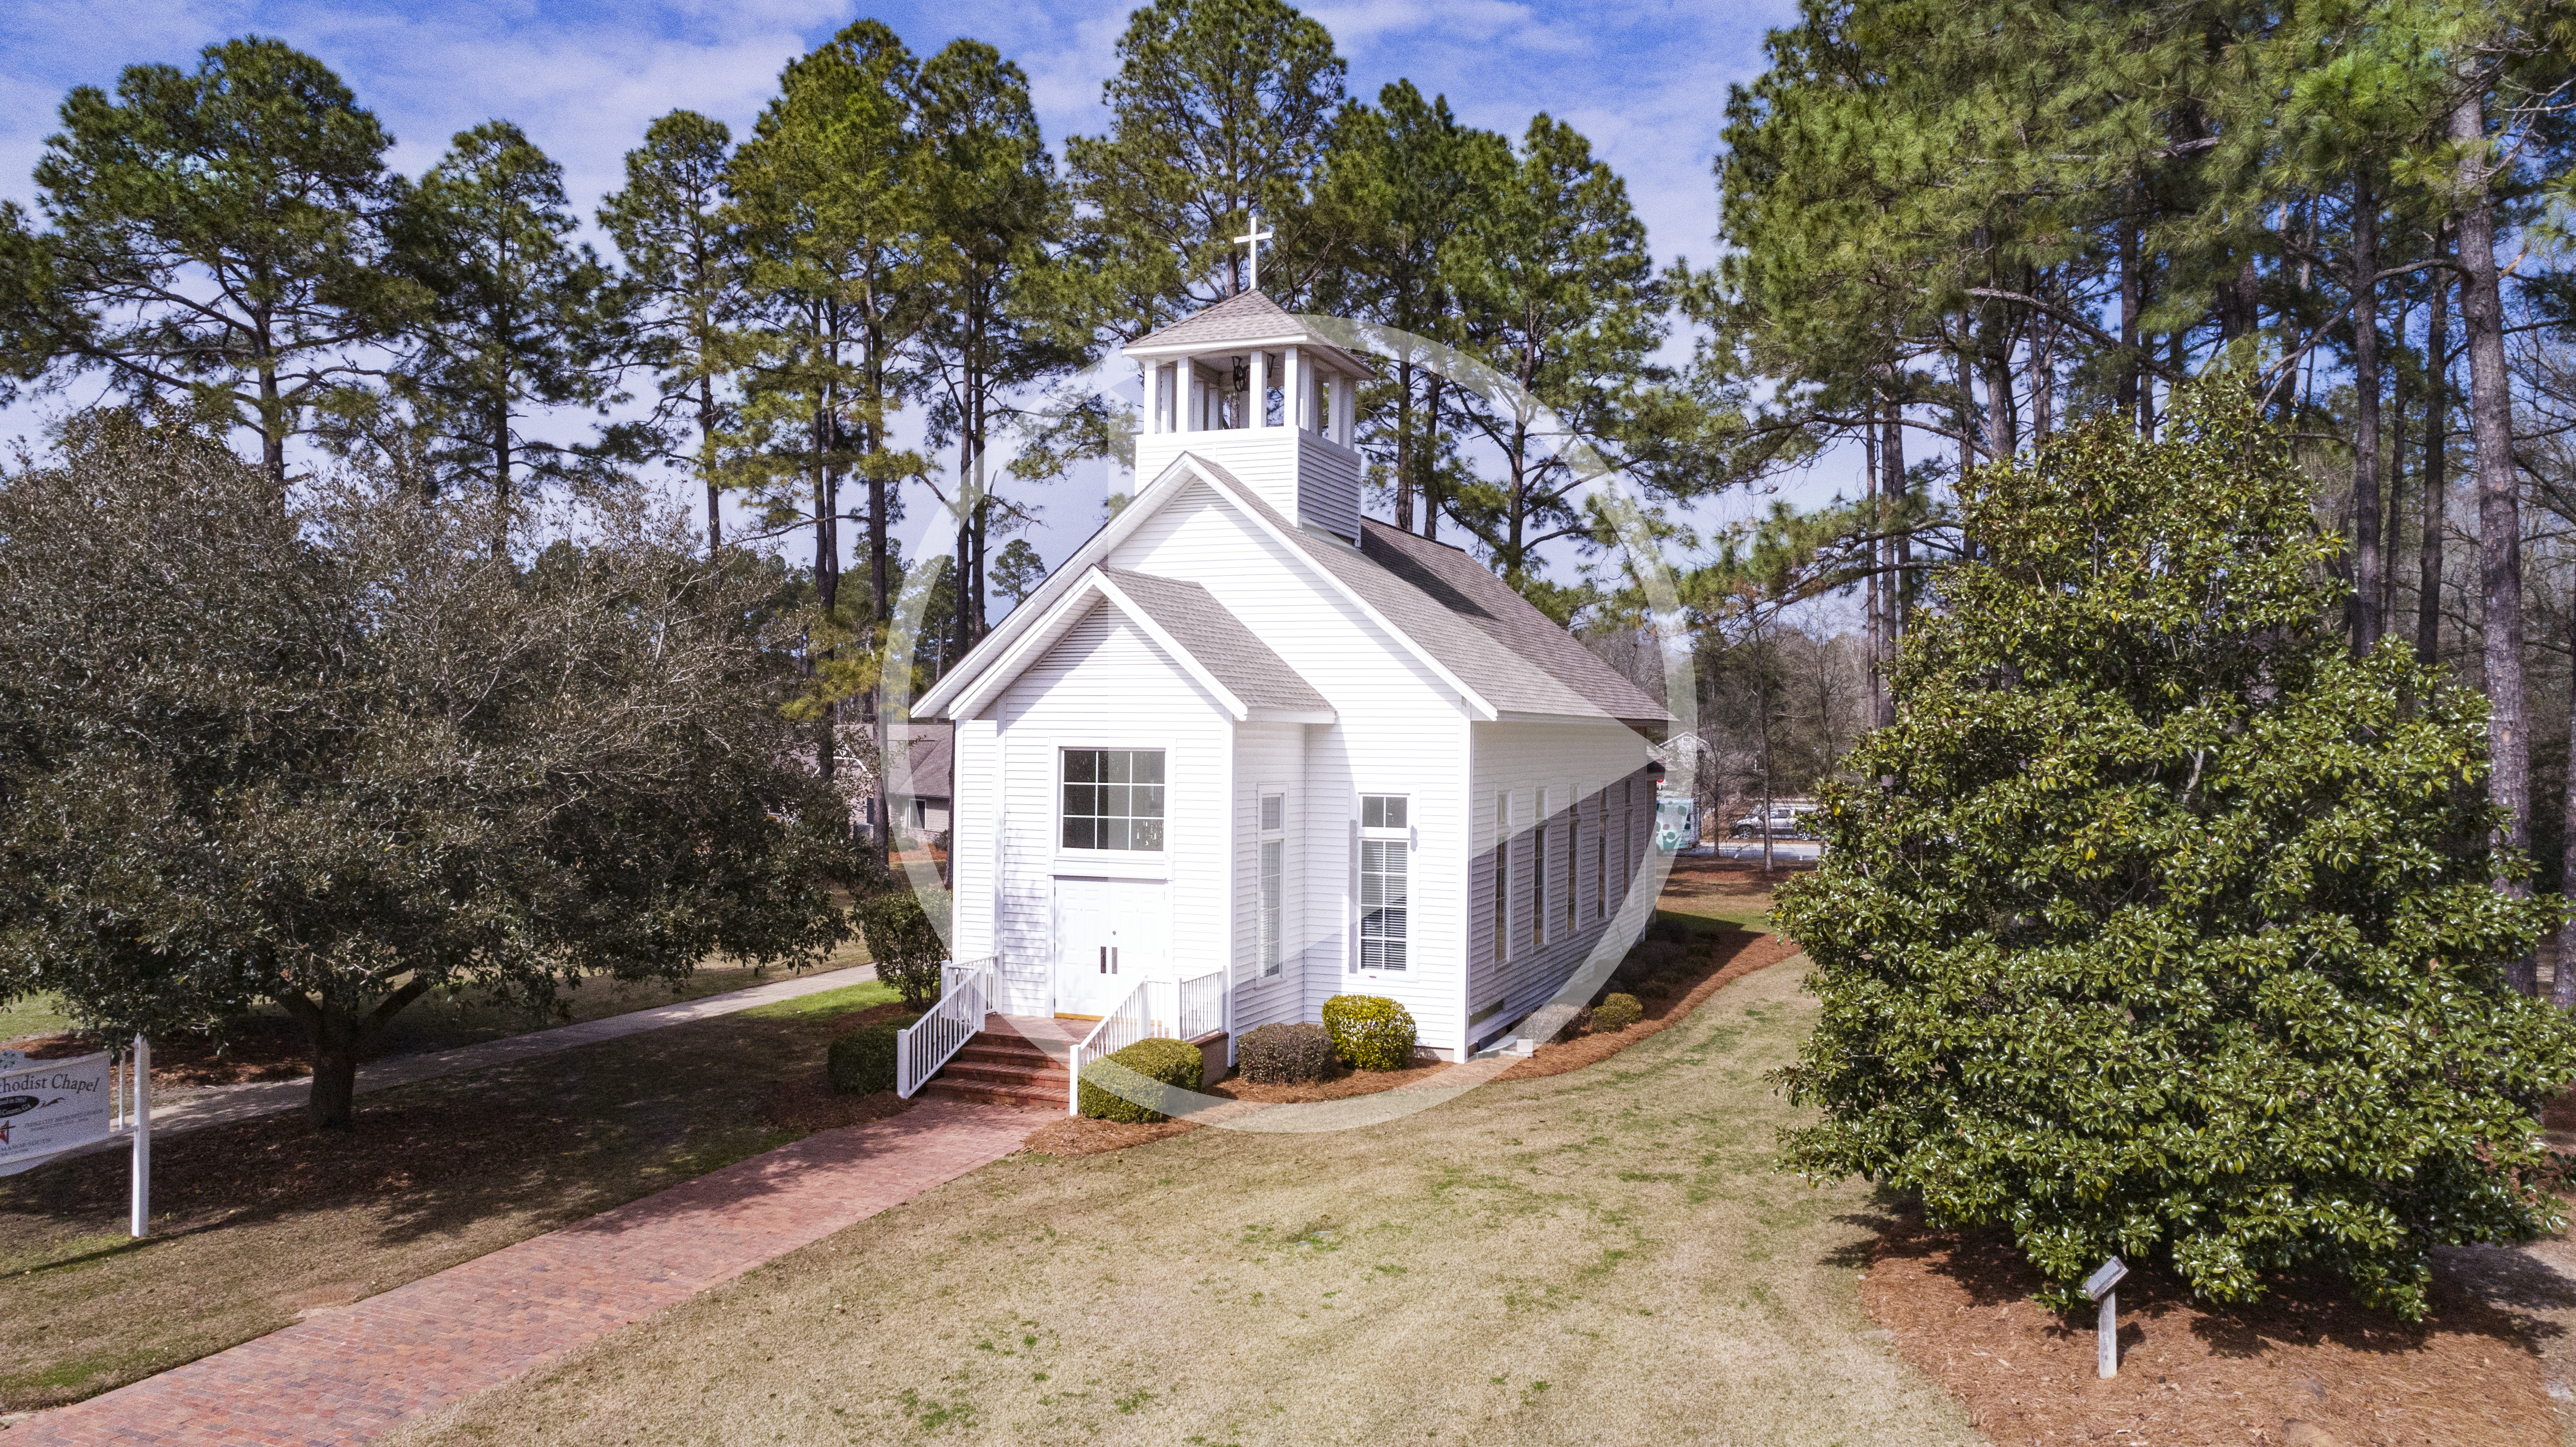 2021 Methodist Conference Video